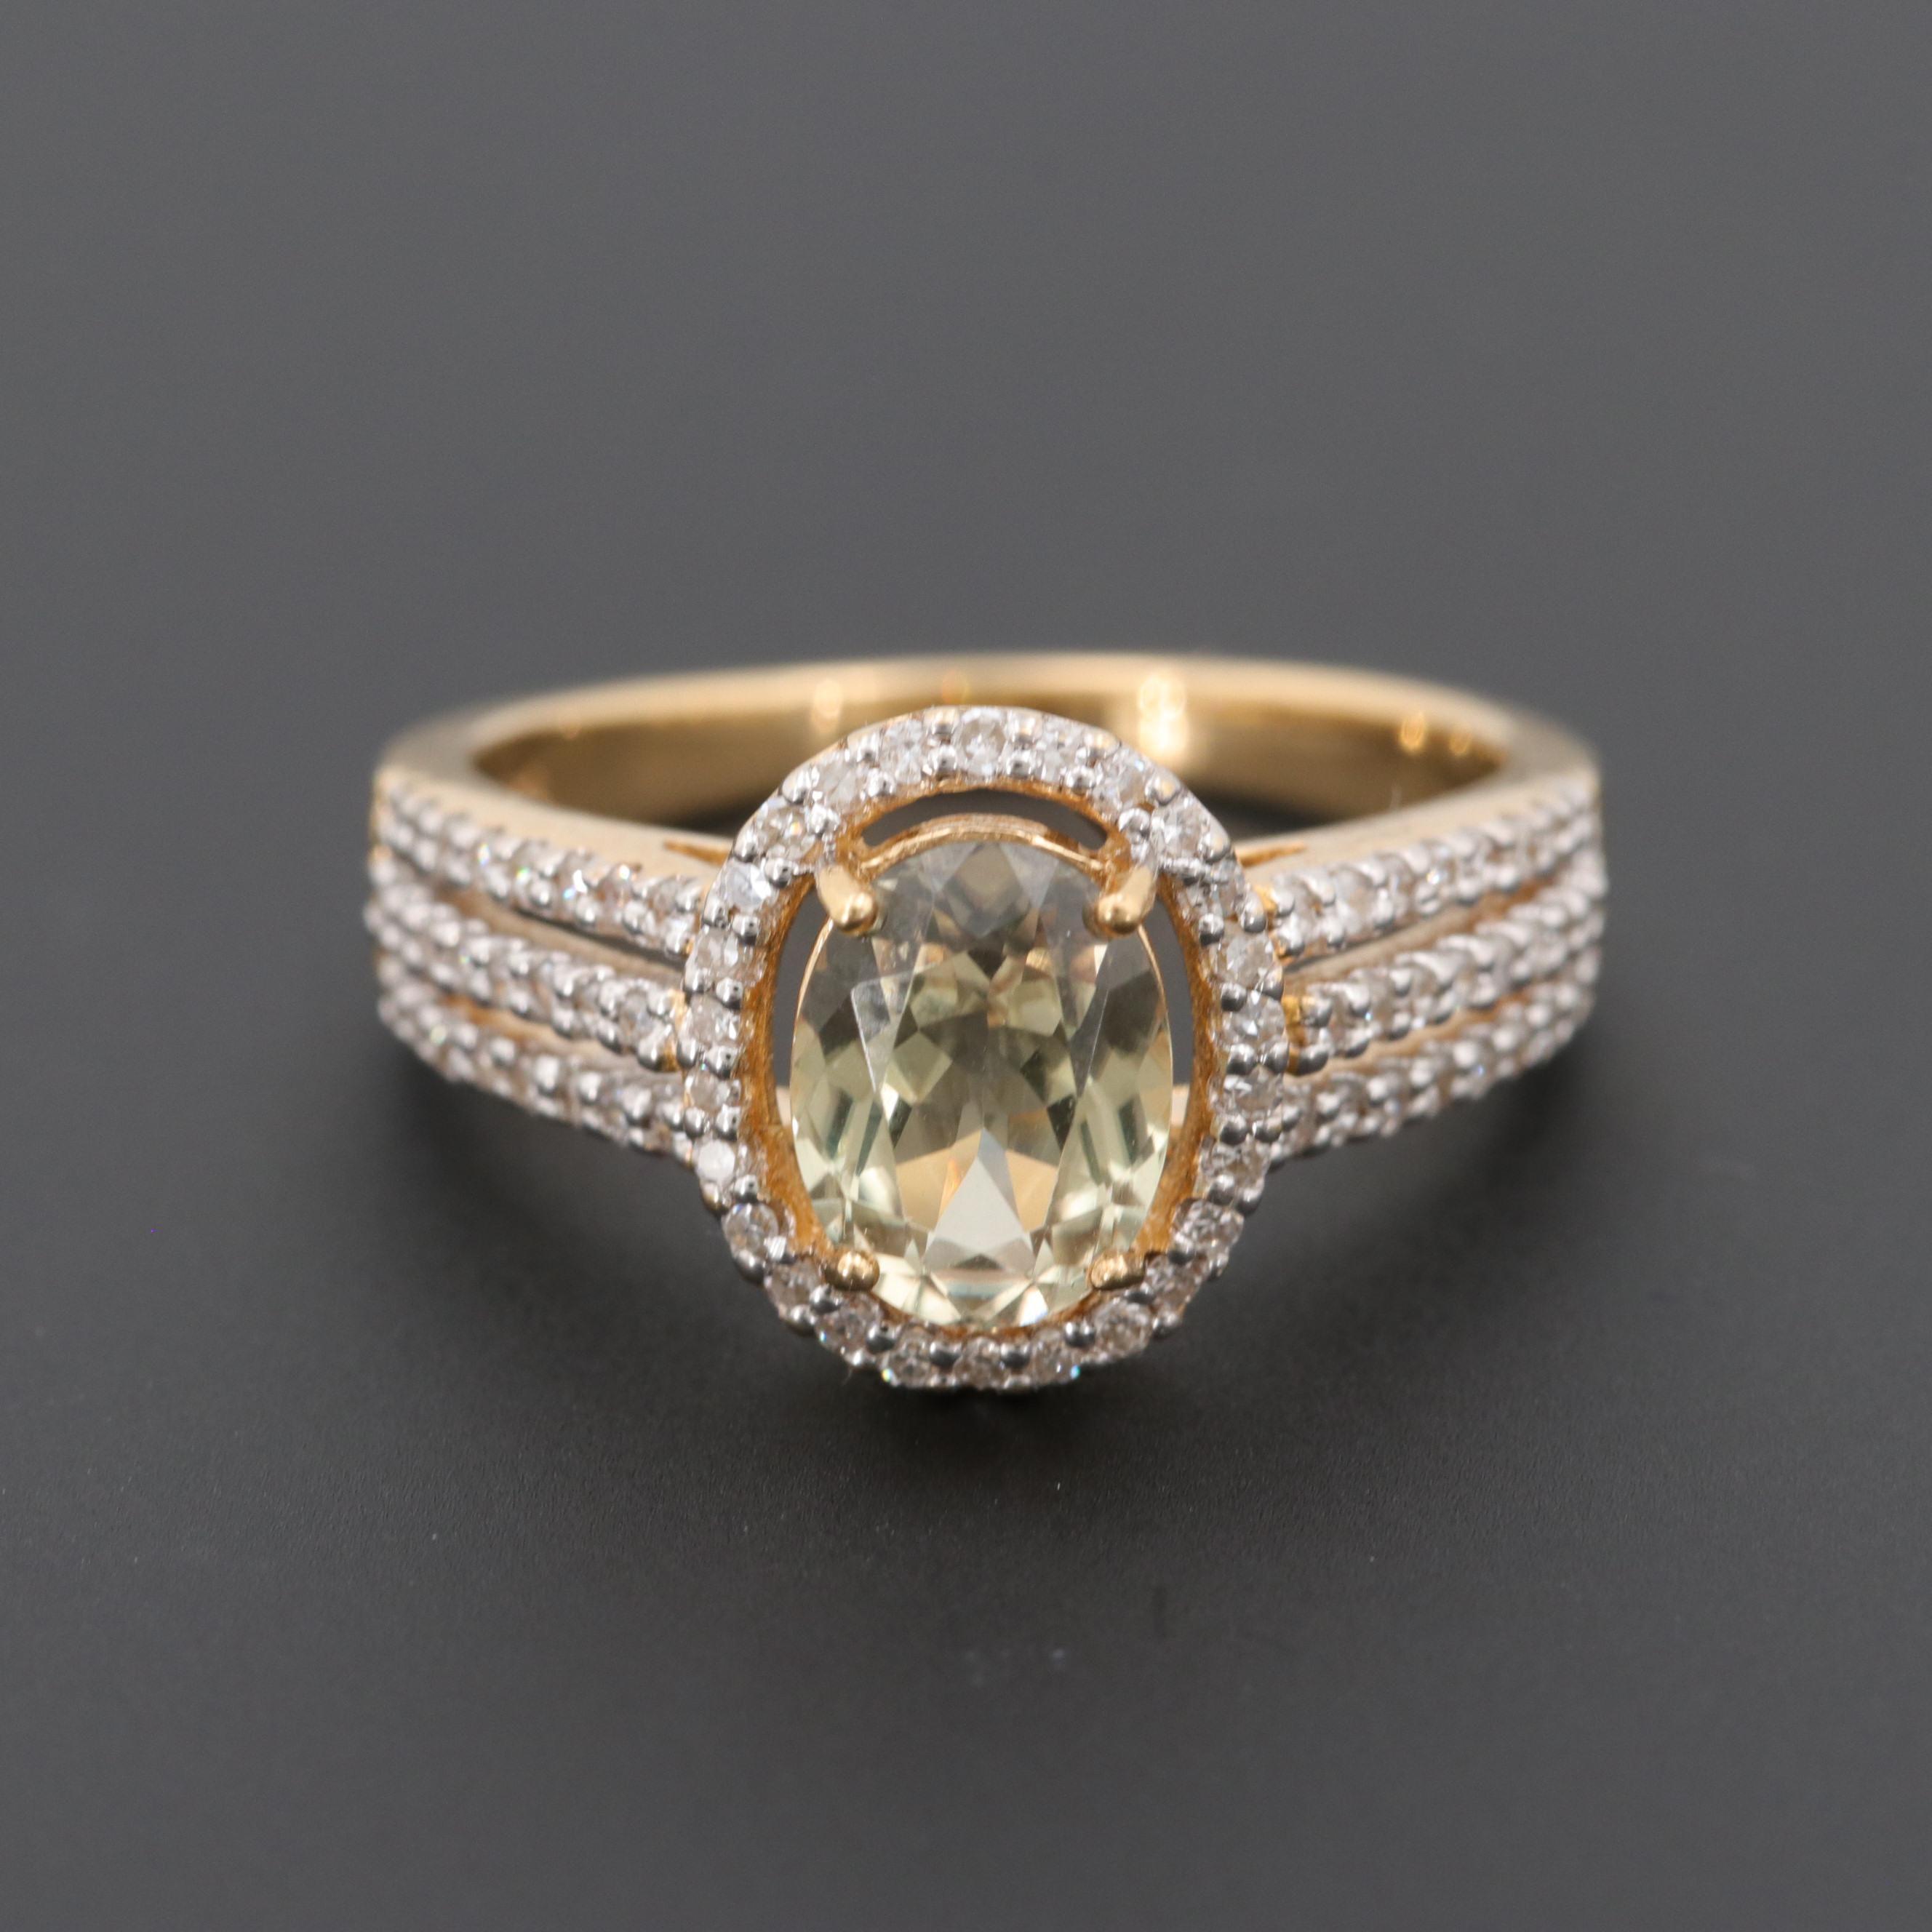 18K Yellow Gold Zultanite Diospore and Diamond Ring